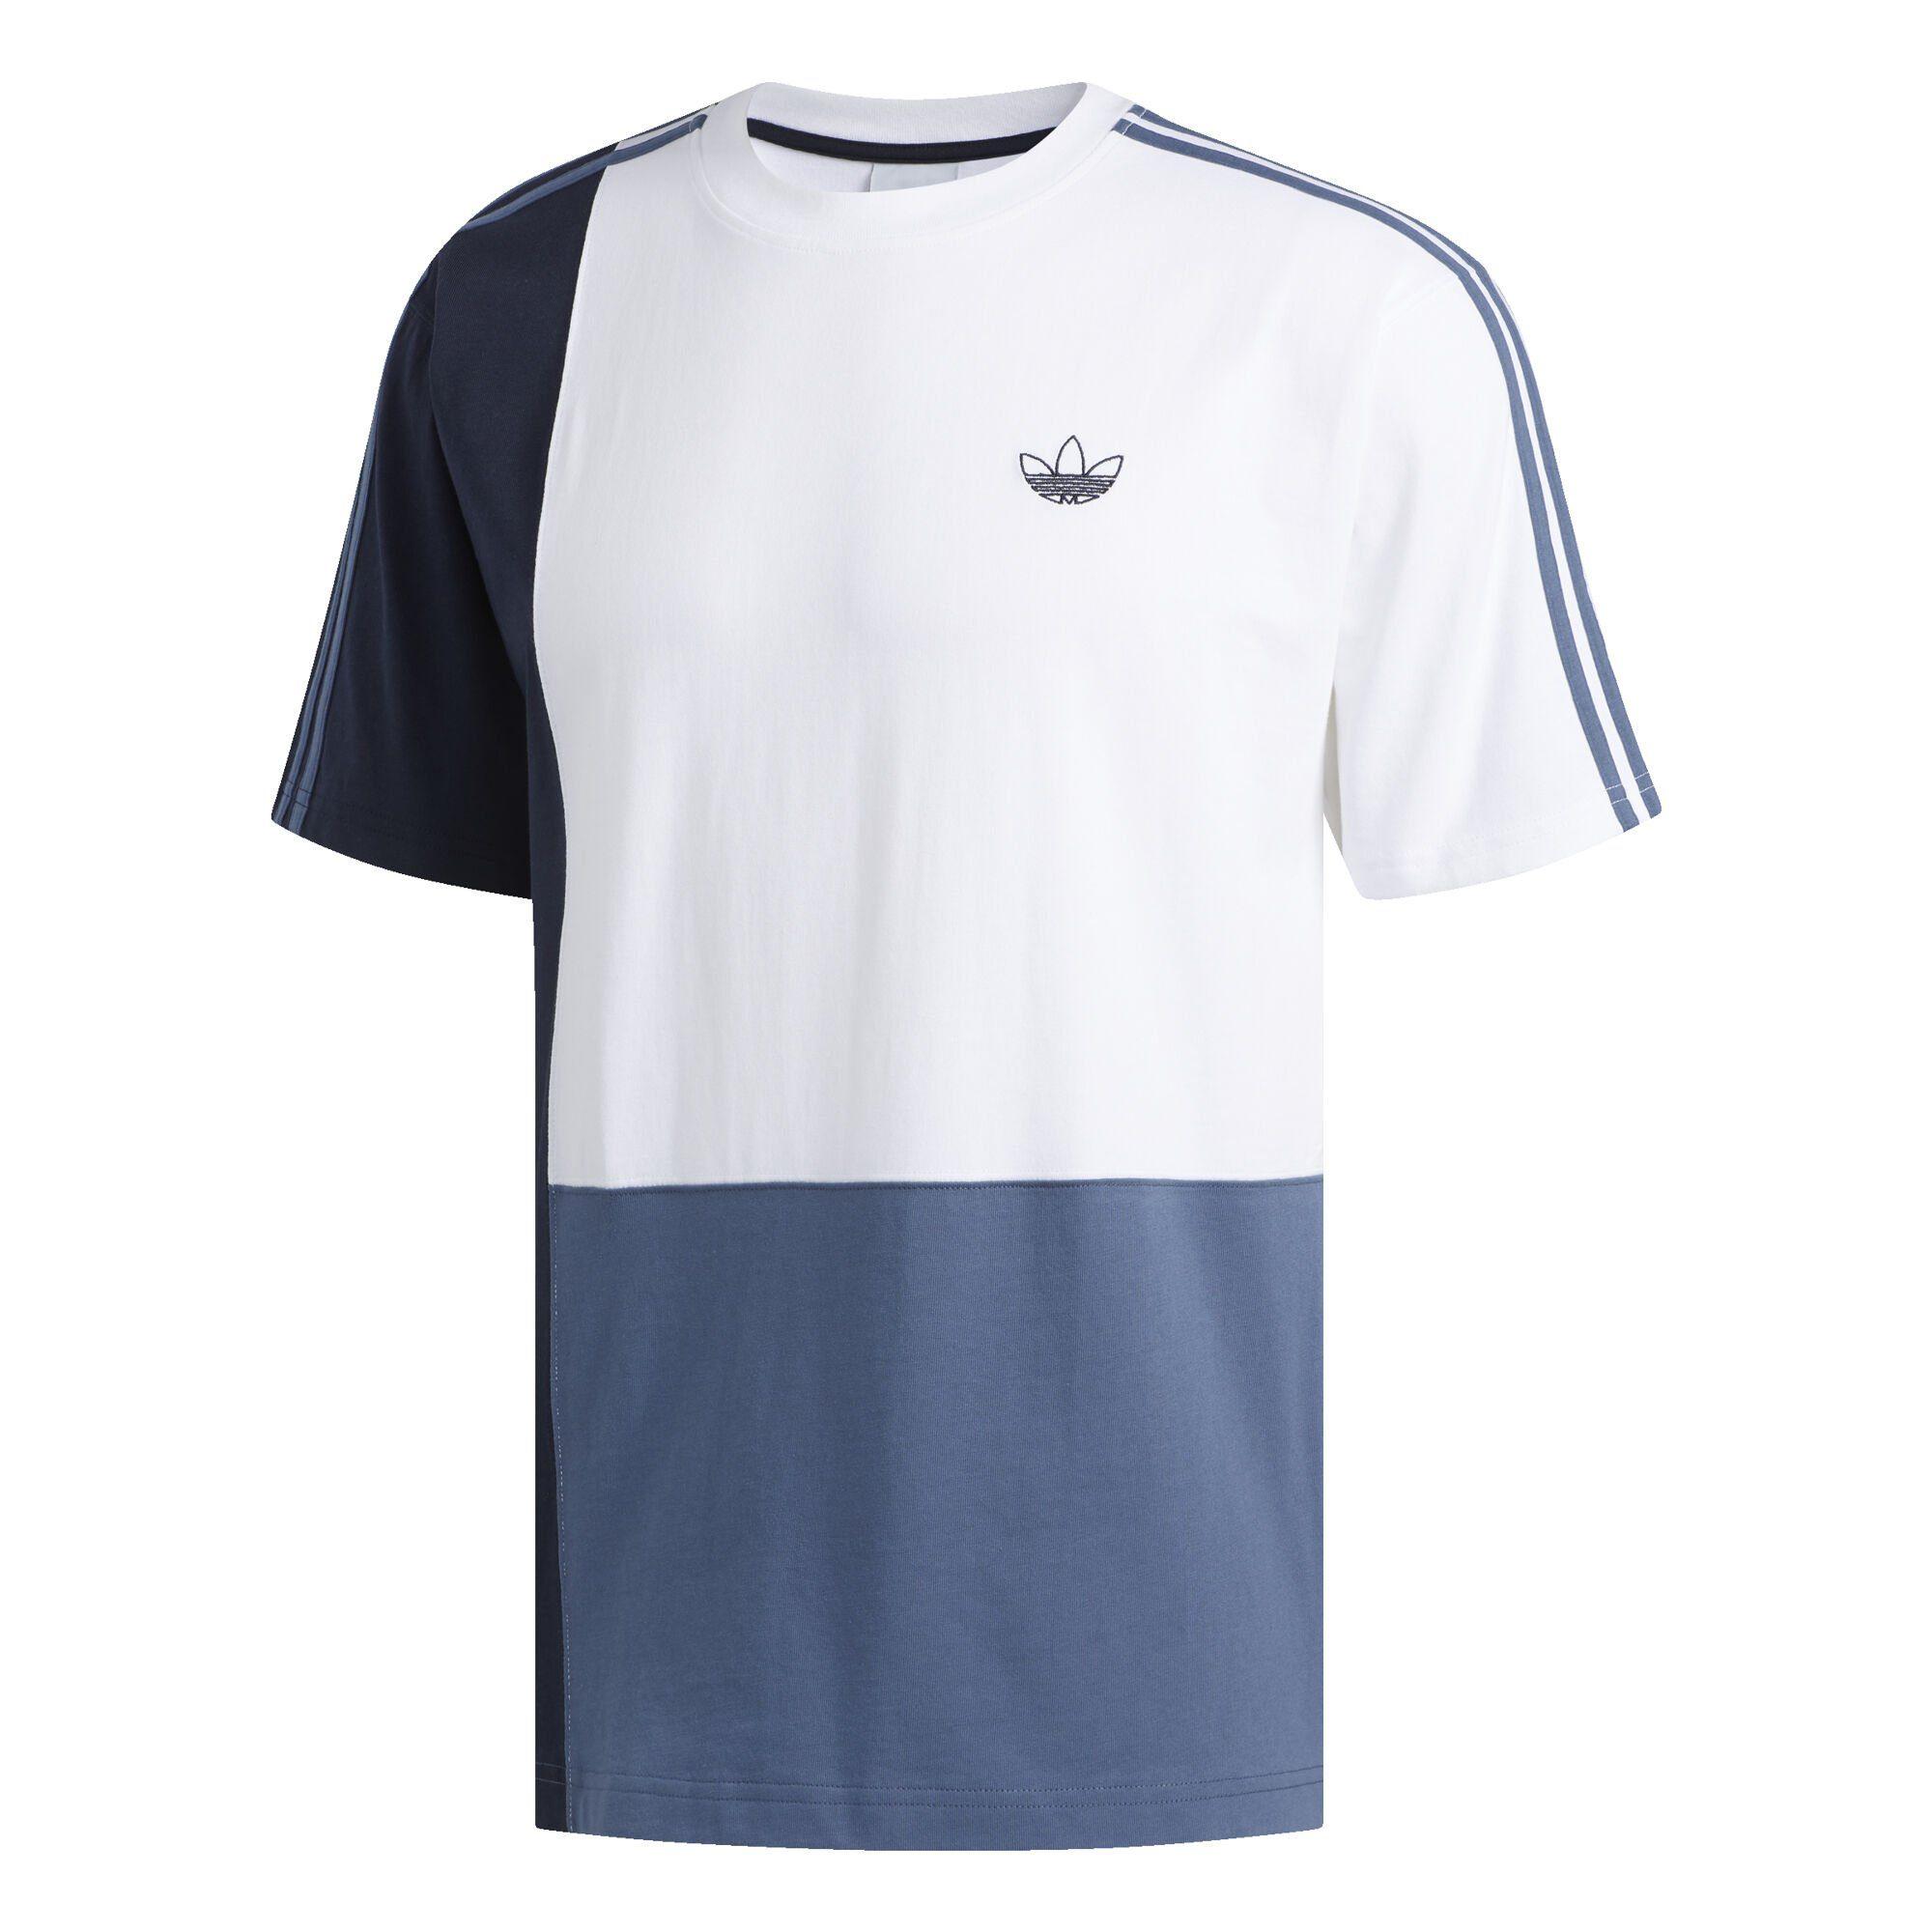 adidas Originals T Shirt »Asymm T Shirt« kaufen | OTTO